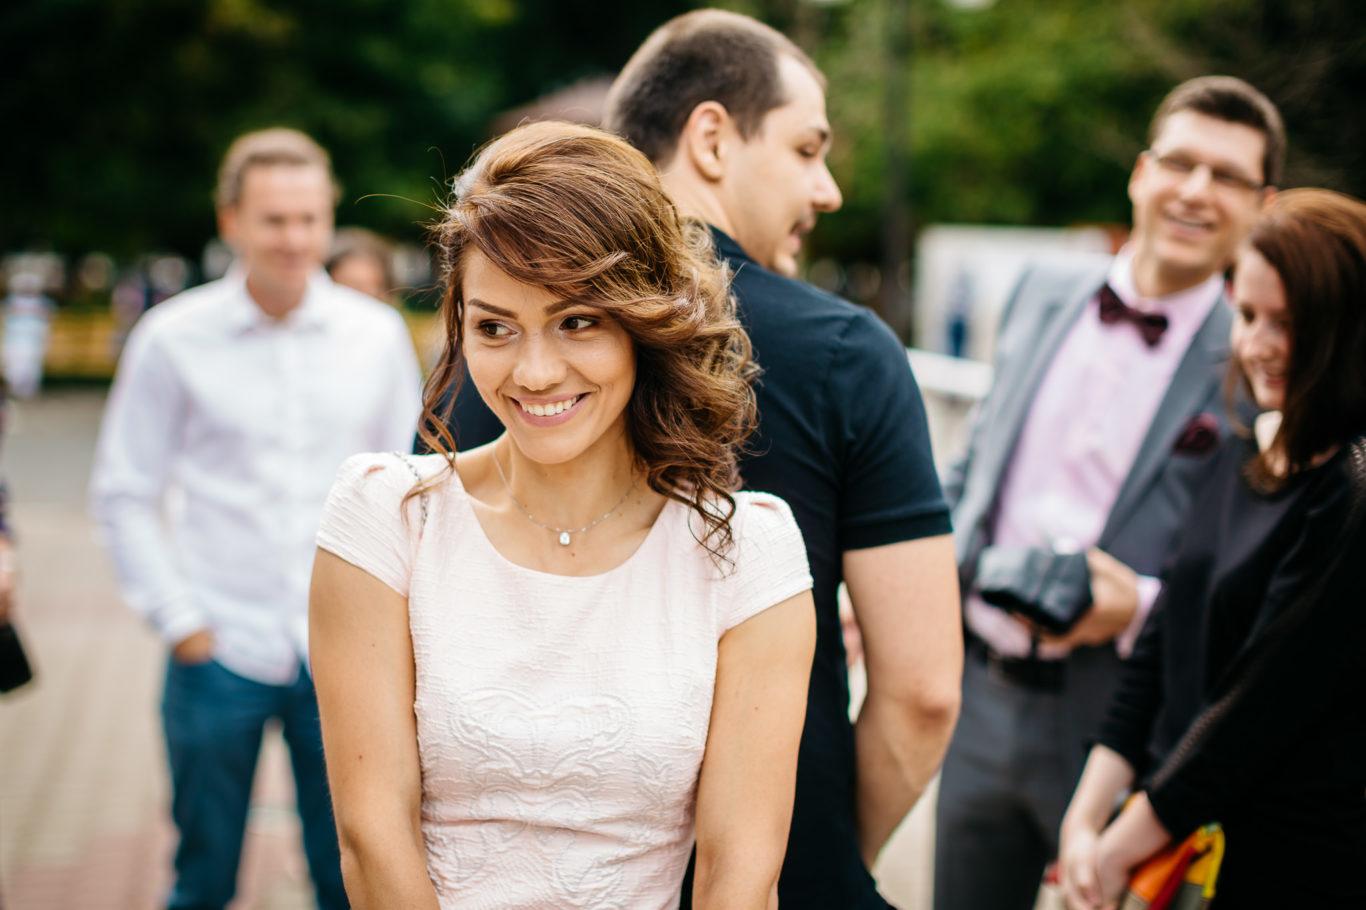 0014-fotografie-nunta-bucuresti-dana-radu-fotograf-ciprian-dumitrescu-cd2_6015